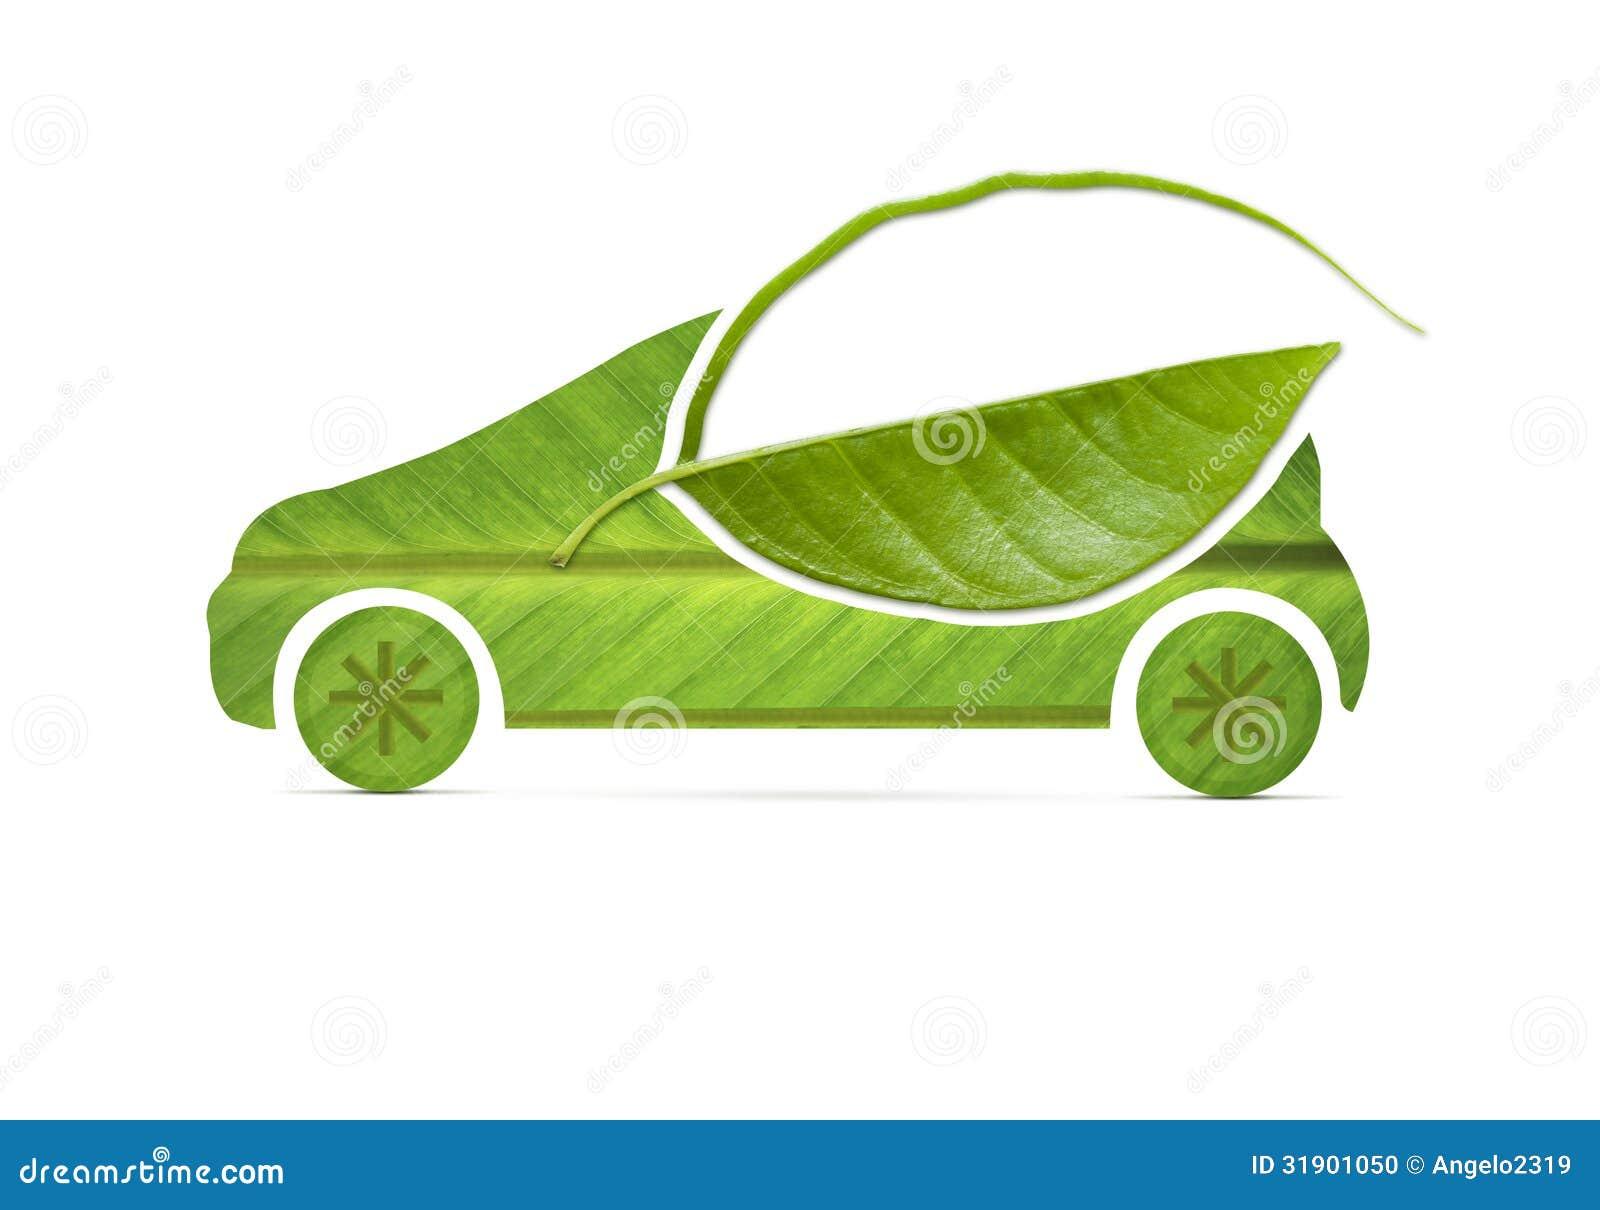 Leaf Eco Car Royalty Free Stock Images - Image: 15551149